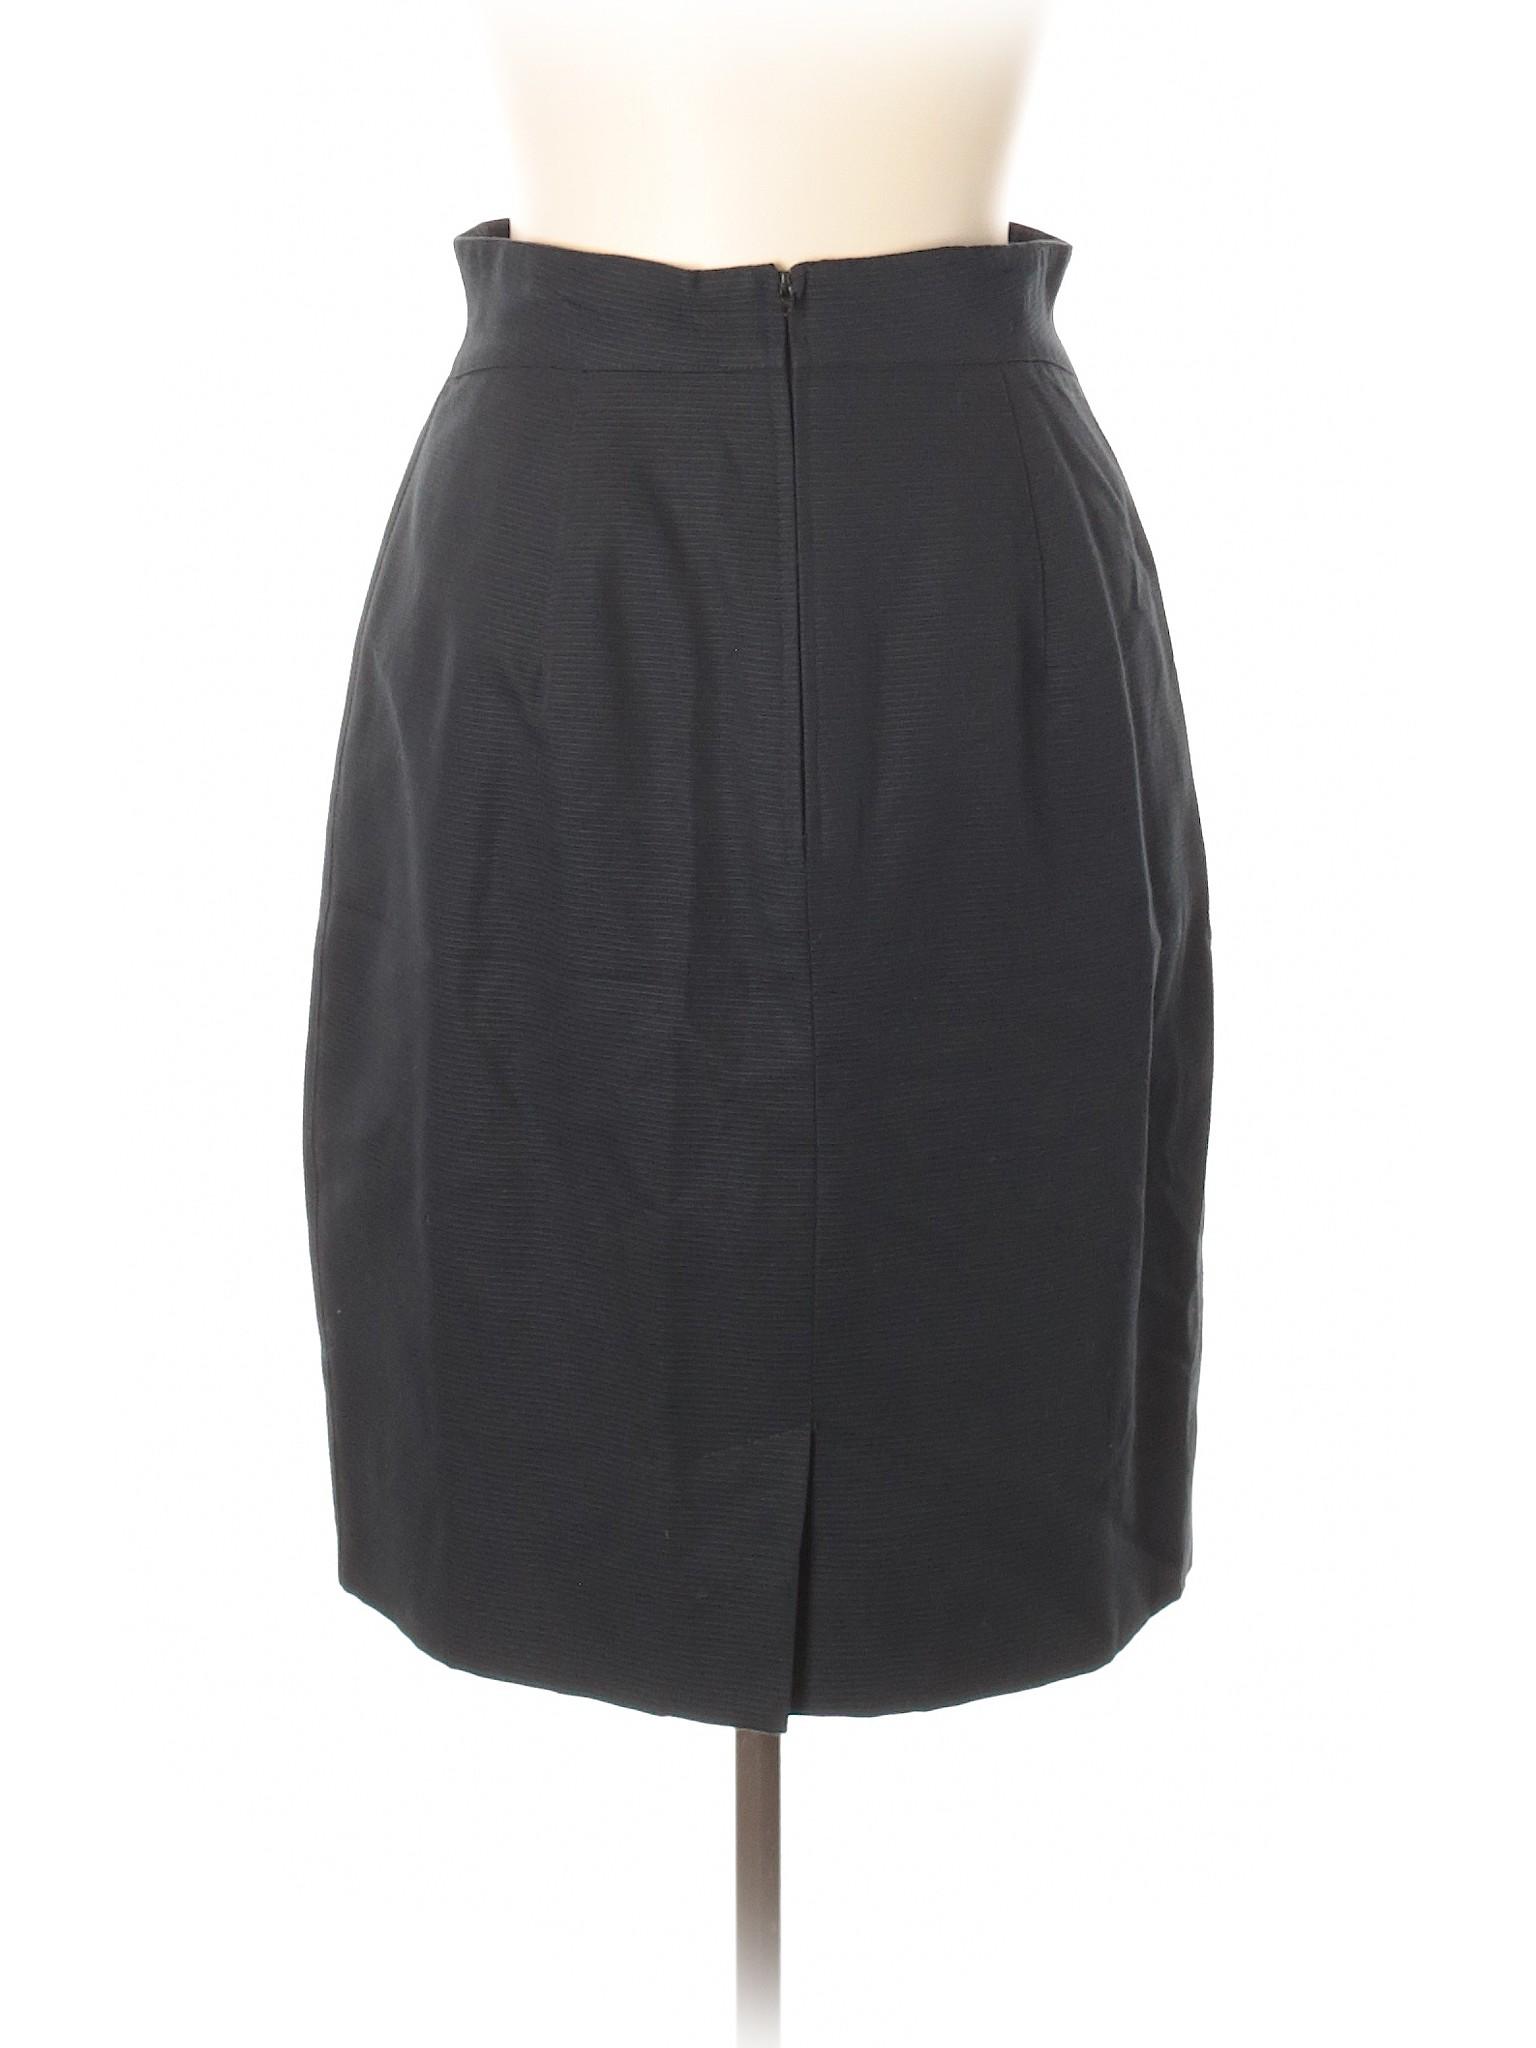 Skirt Casual Skirt Skirt Boutique Casual Casual Casual Boutique Skirt Boutique Boutique agXwqO5x